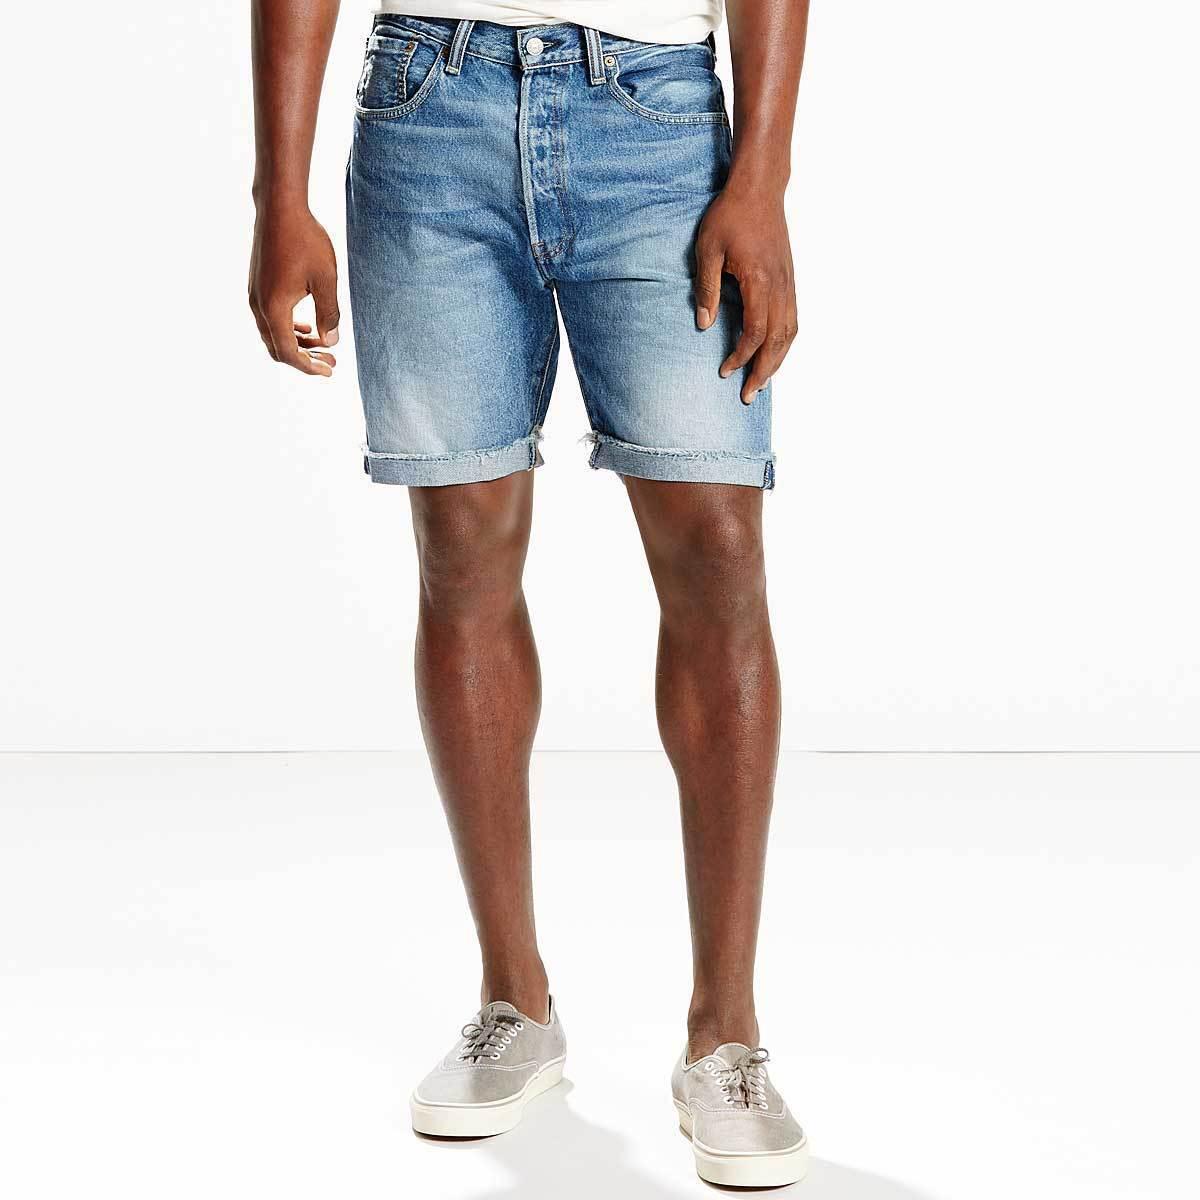 NWT Men's Levi's 501 CT Denim Shorts Carrier Ace Gower 236790009